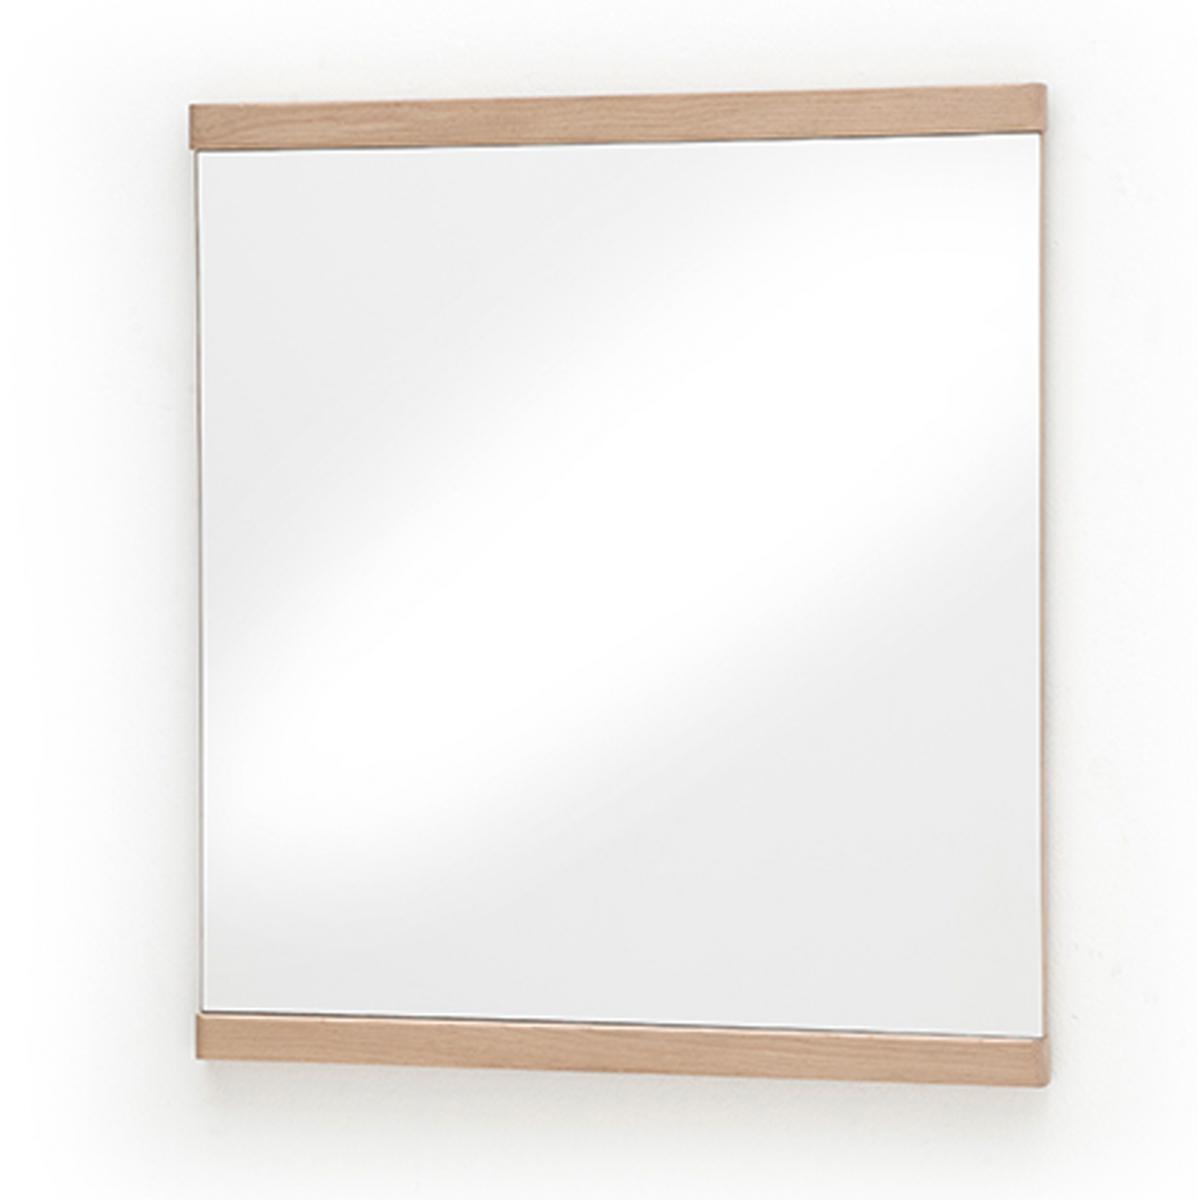 Pegane Miroir design en bois coloris chêne sombre - L.75 x H.82 x P.3 cm